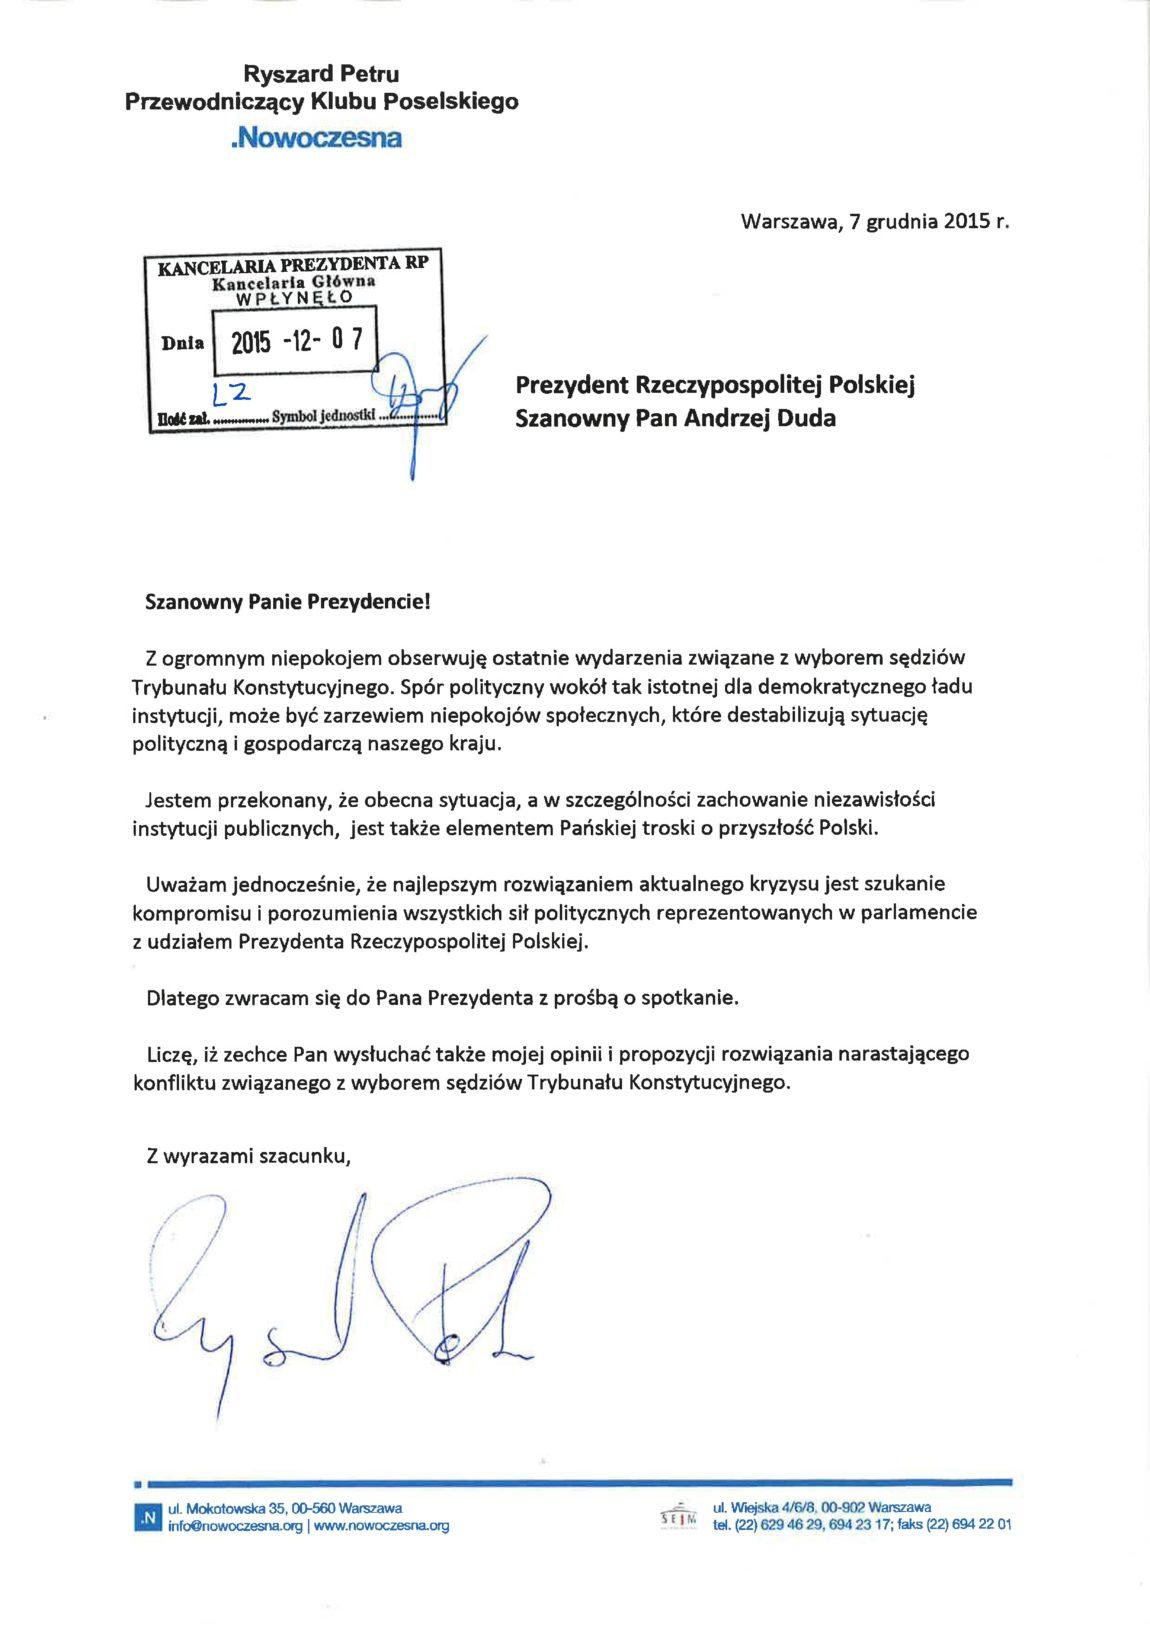 List Ryszarda Petru do Prezydenta RP